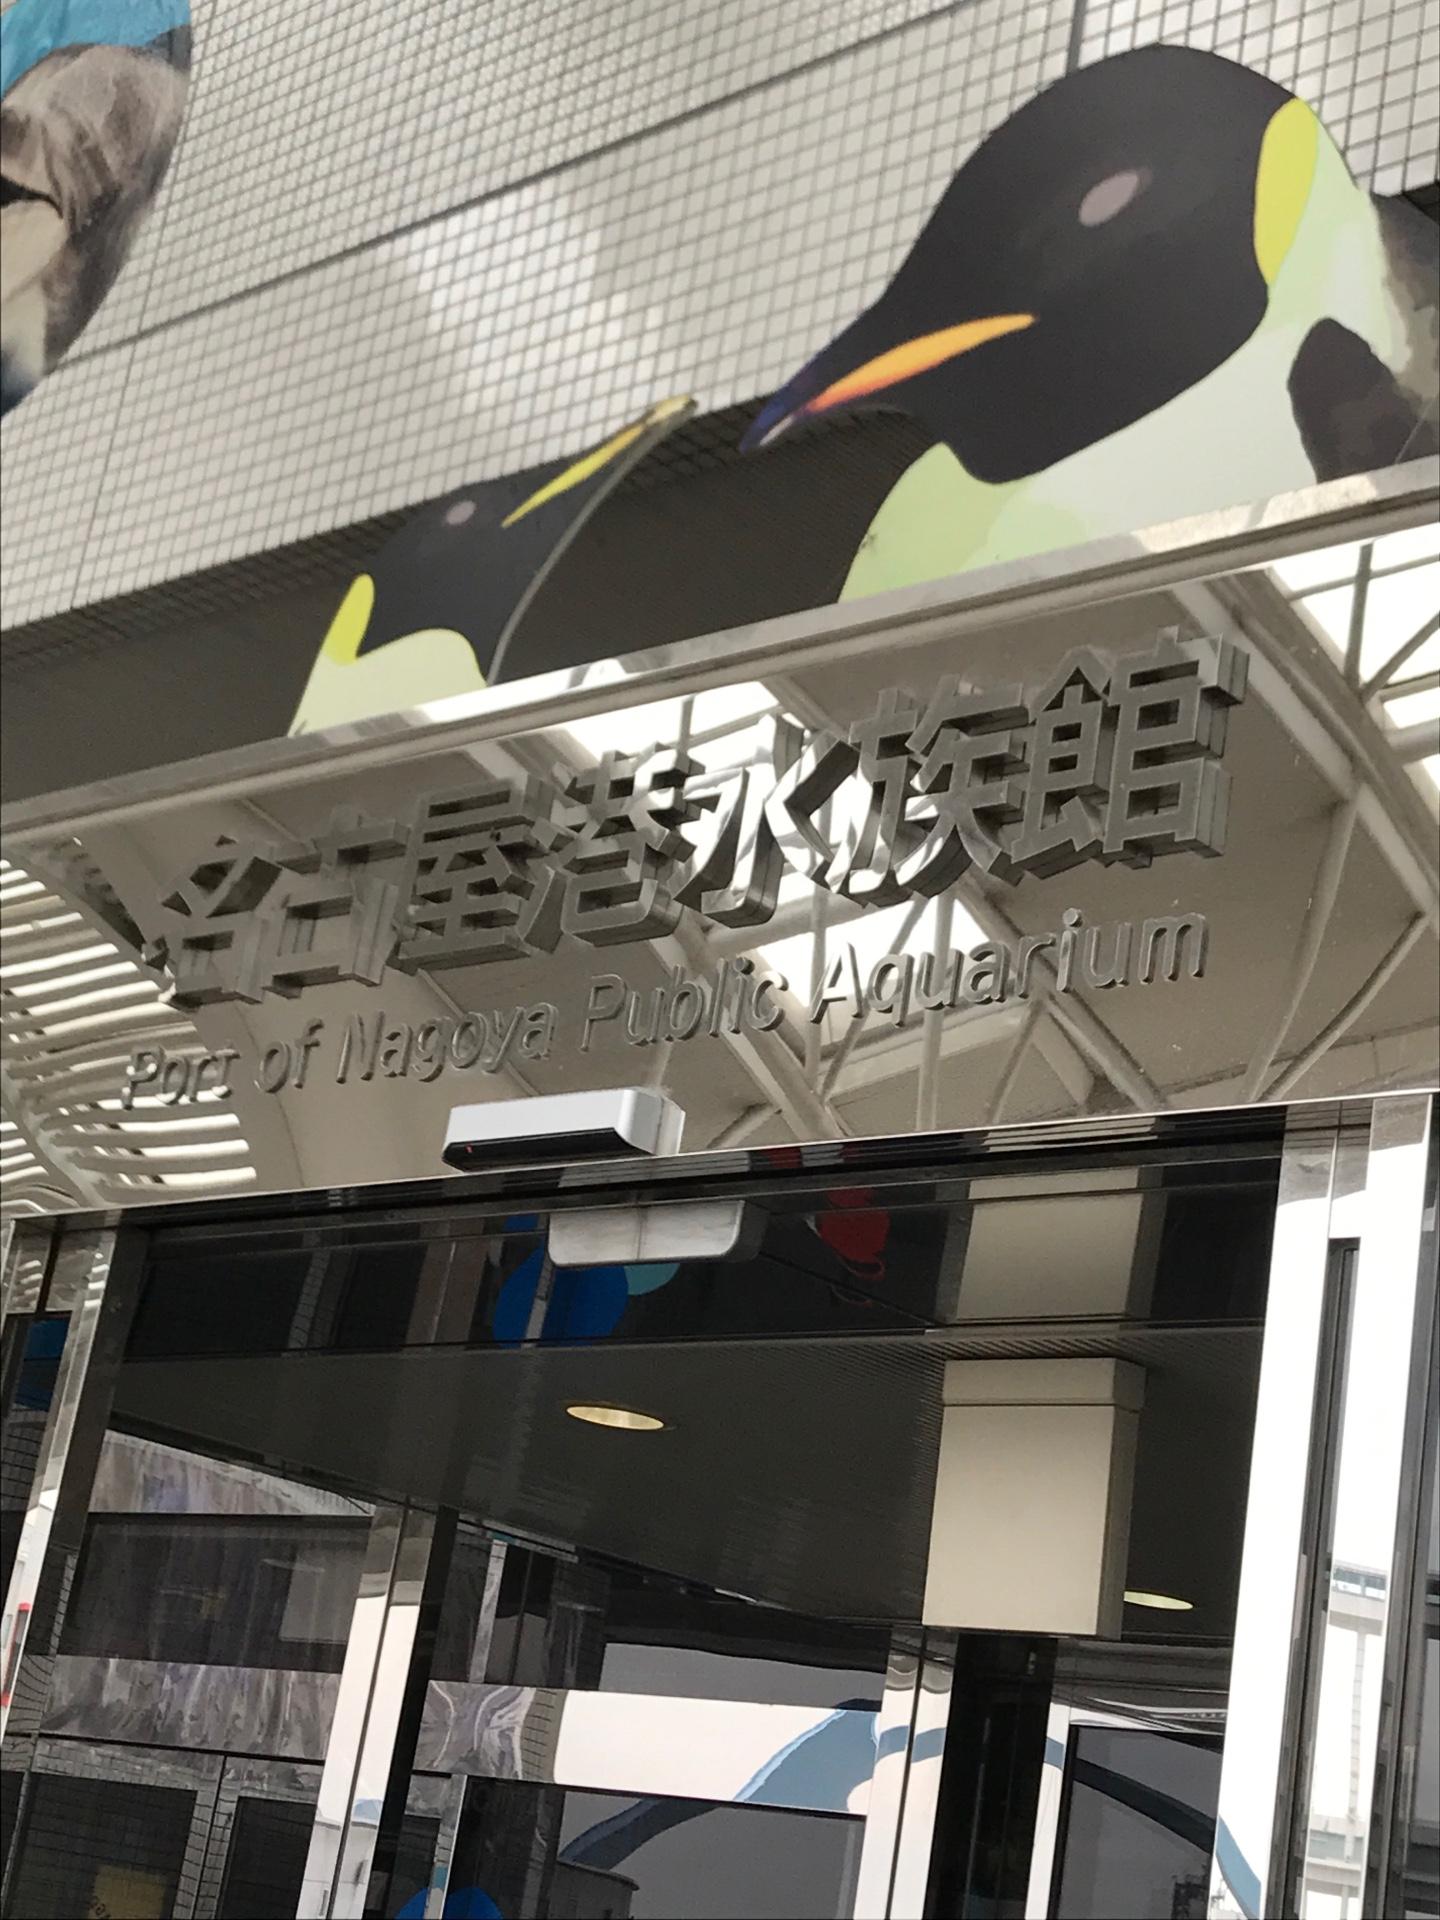 名古屋港水族館の駐車場